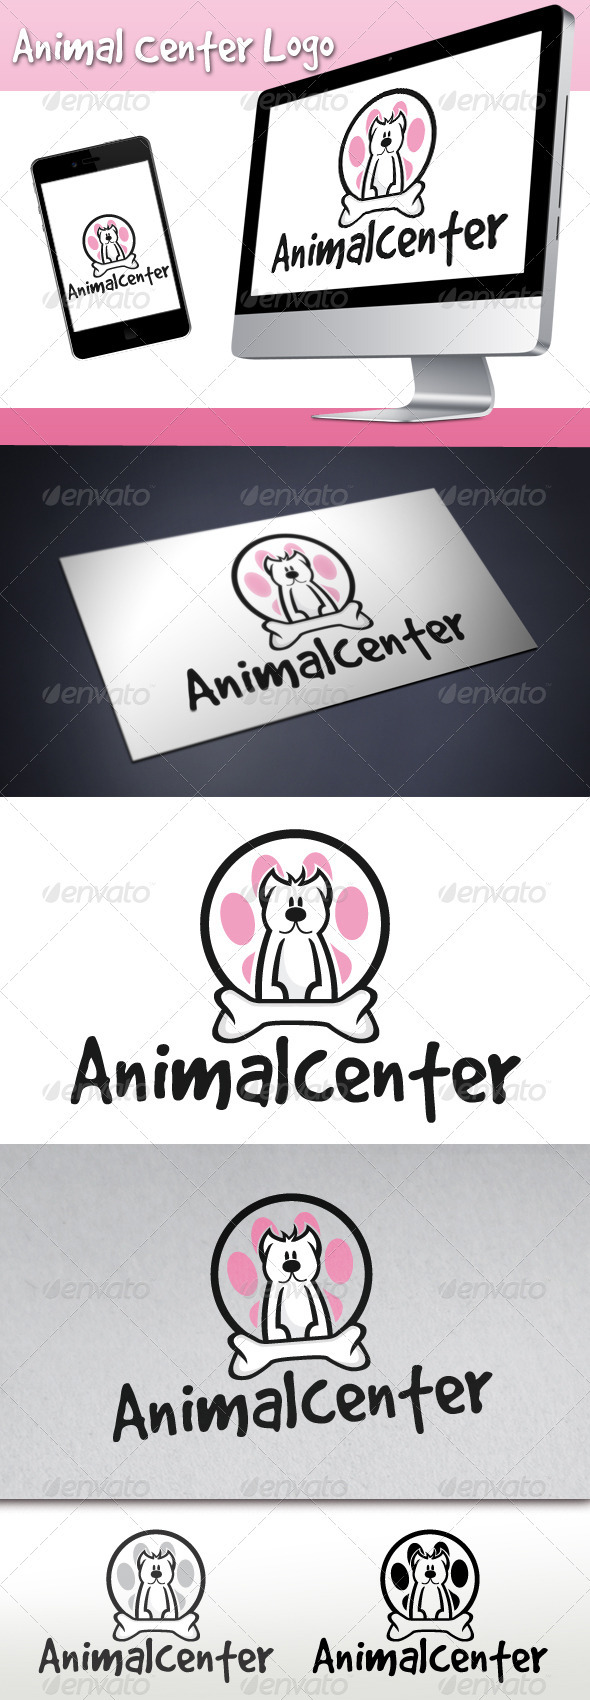 Animal Center Logo